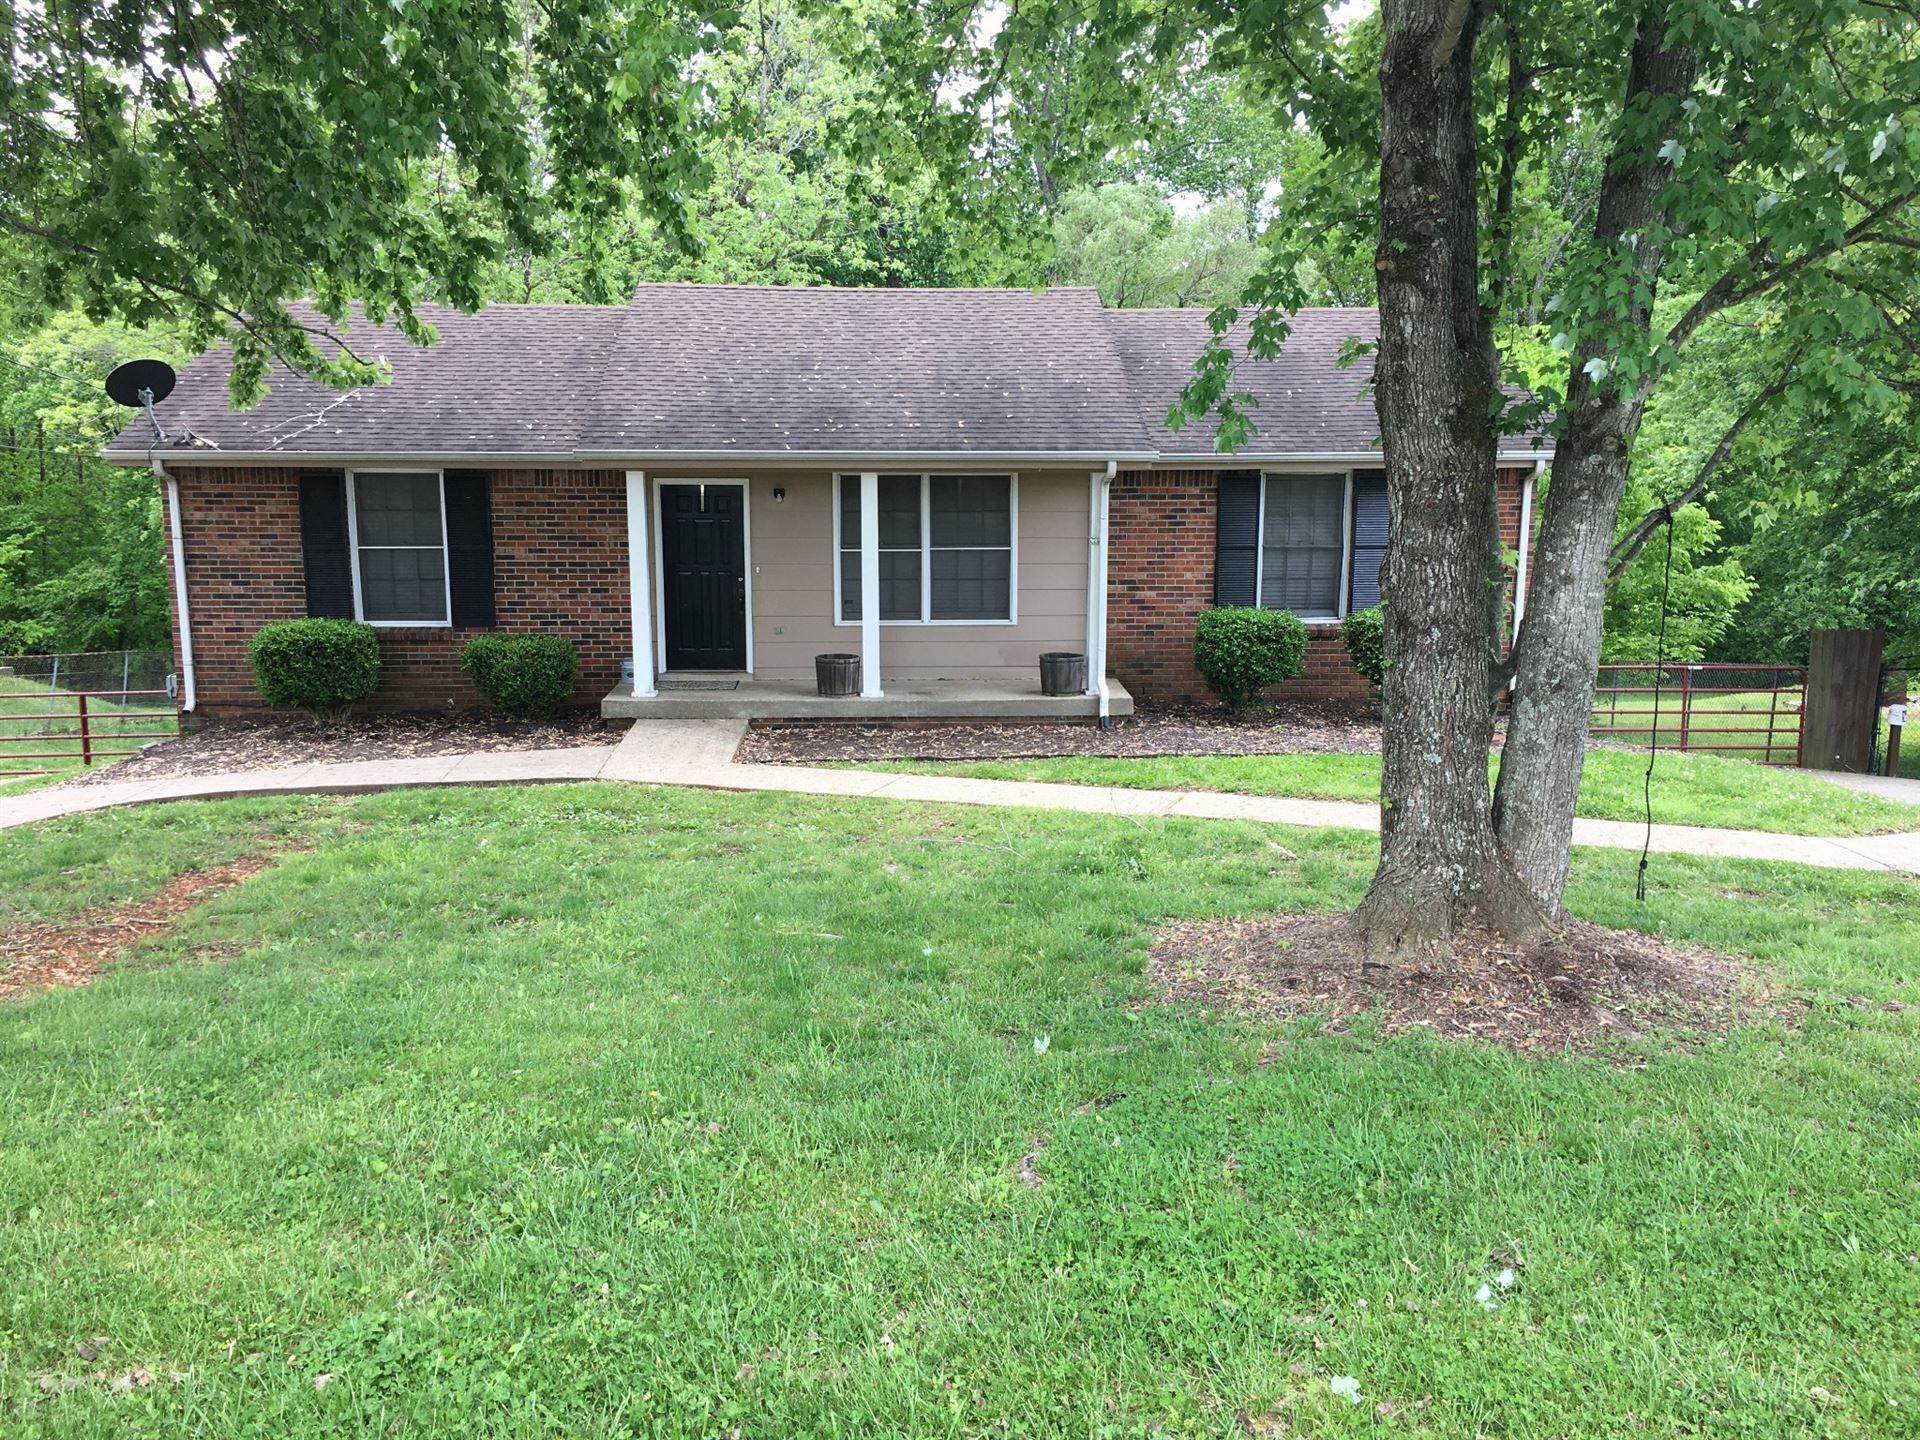 610 Overton Dr, Clarksville, TN 37042 - MLS#: 2251222